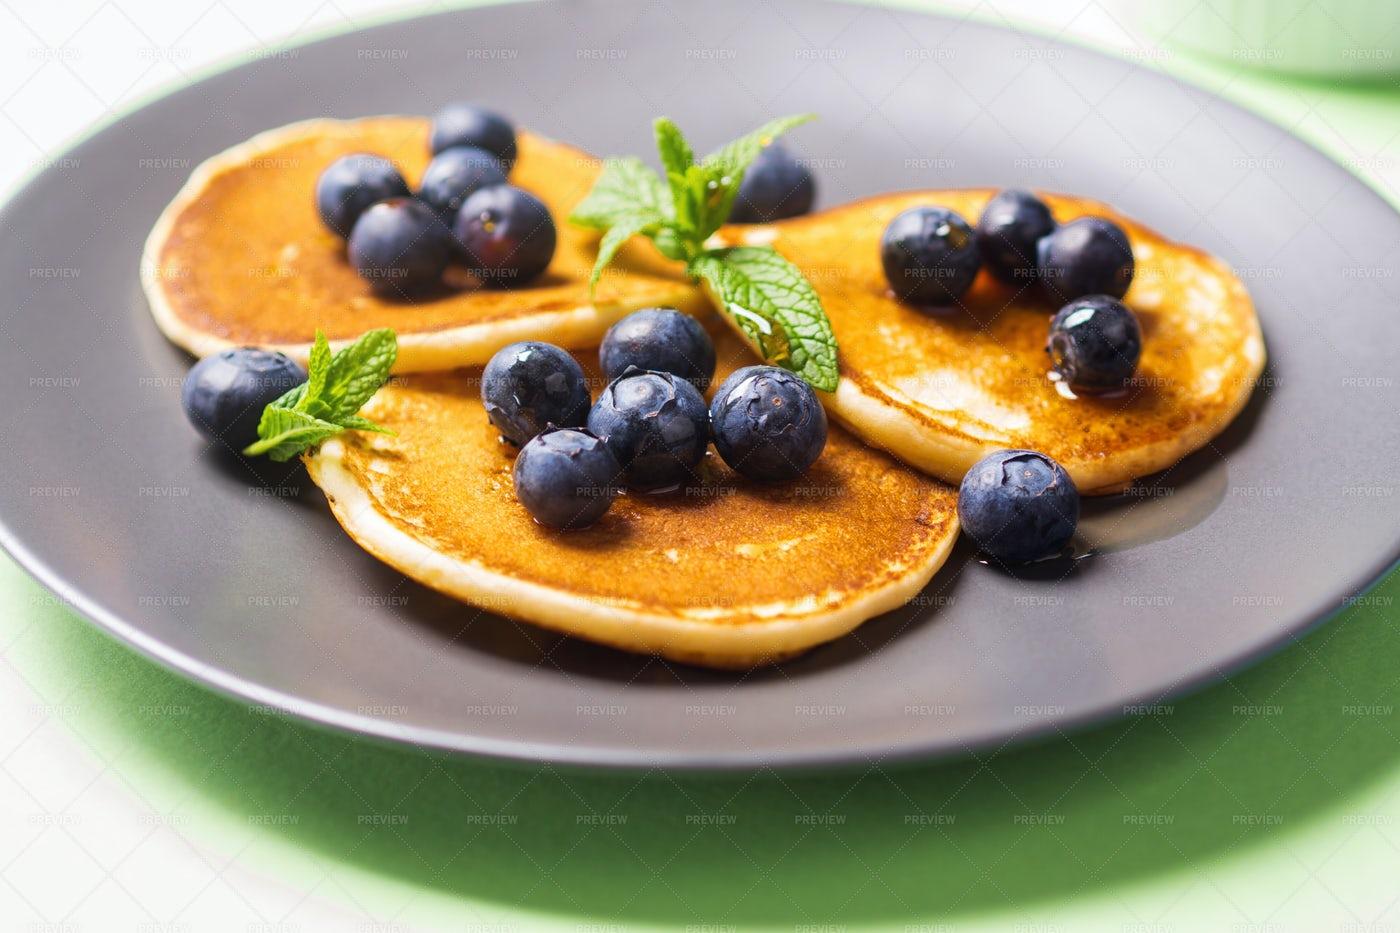 Pancakes With Blueberries: Stock Photos